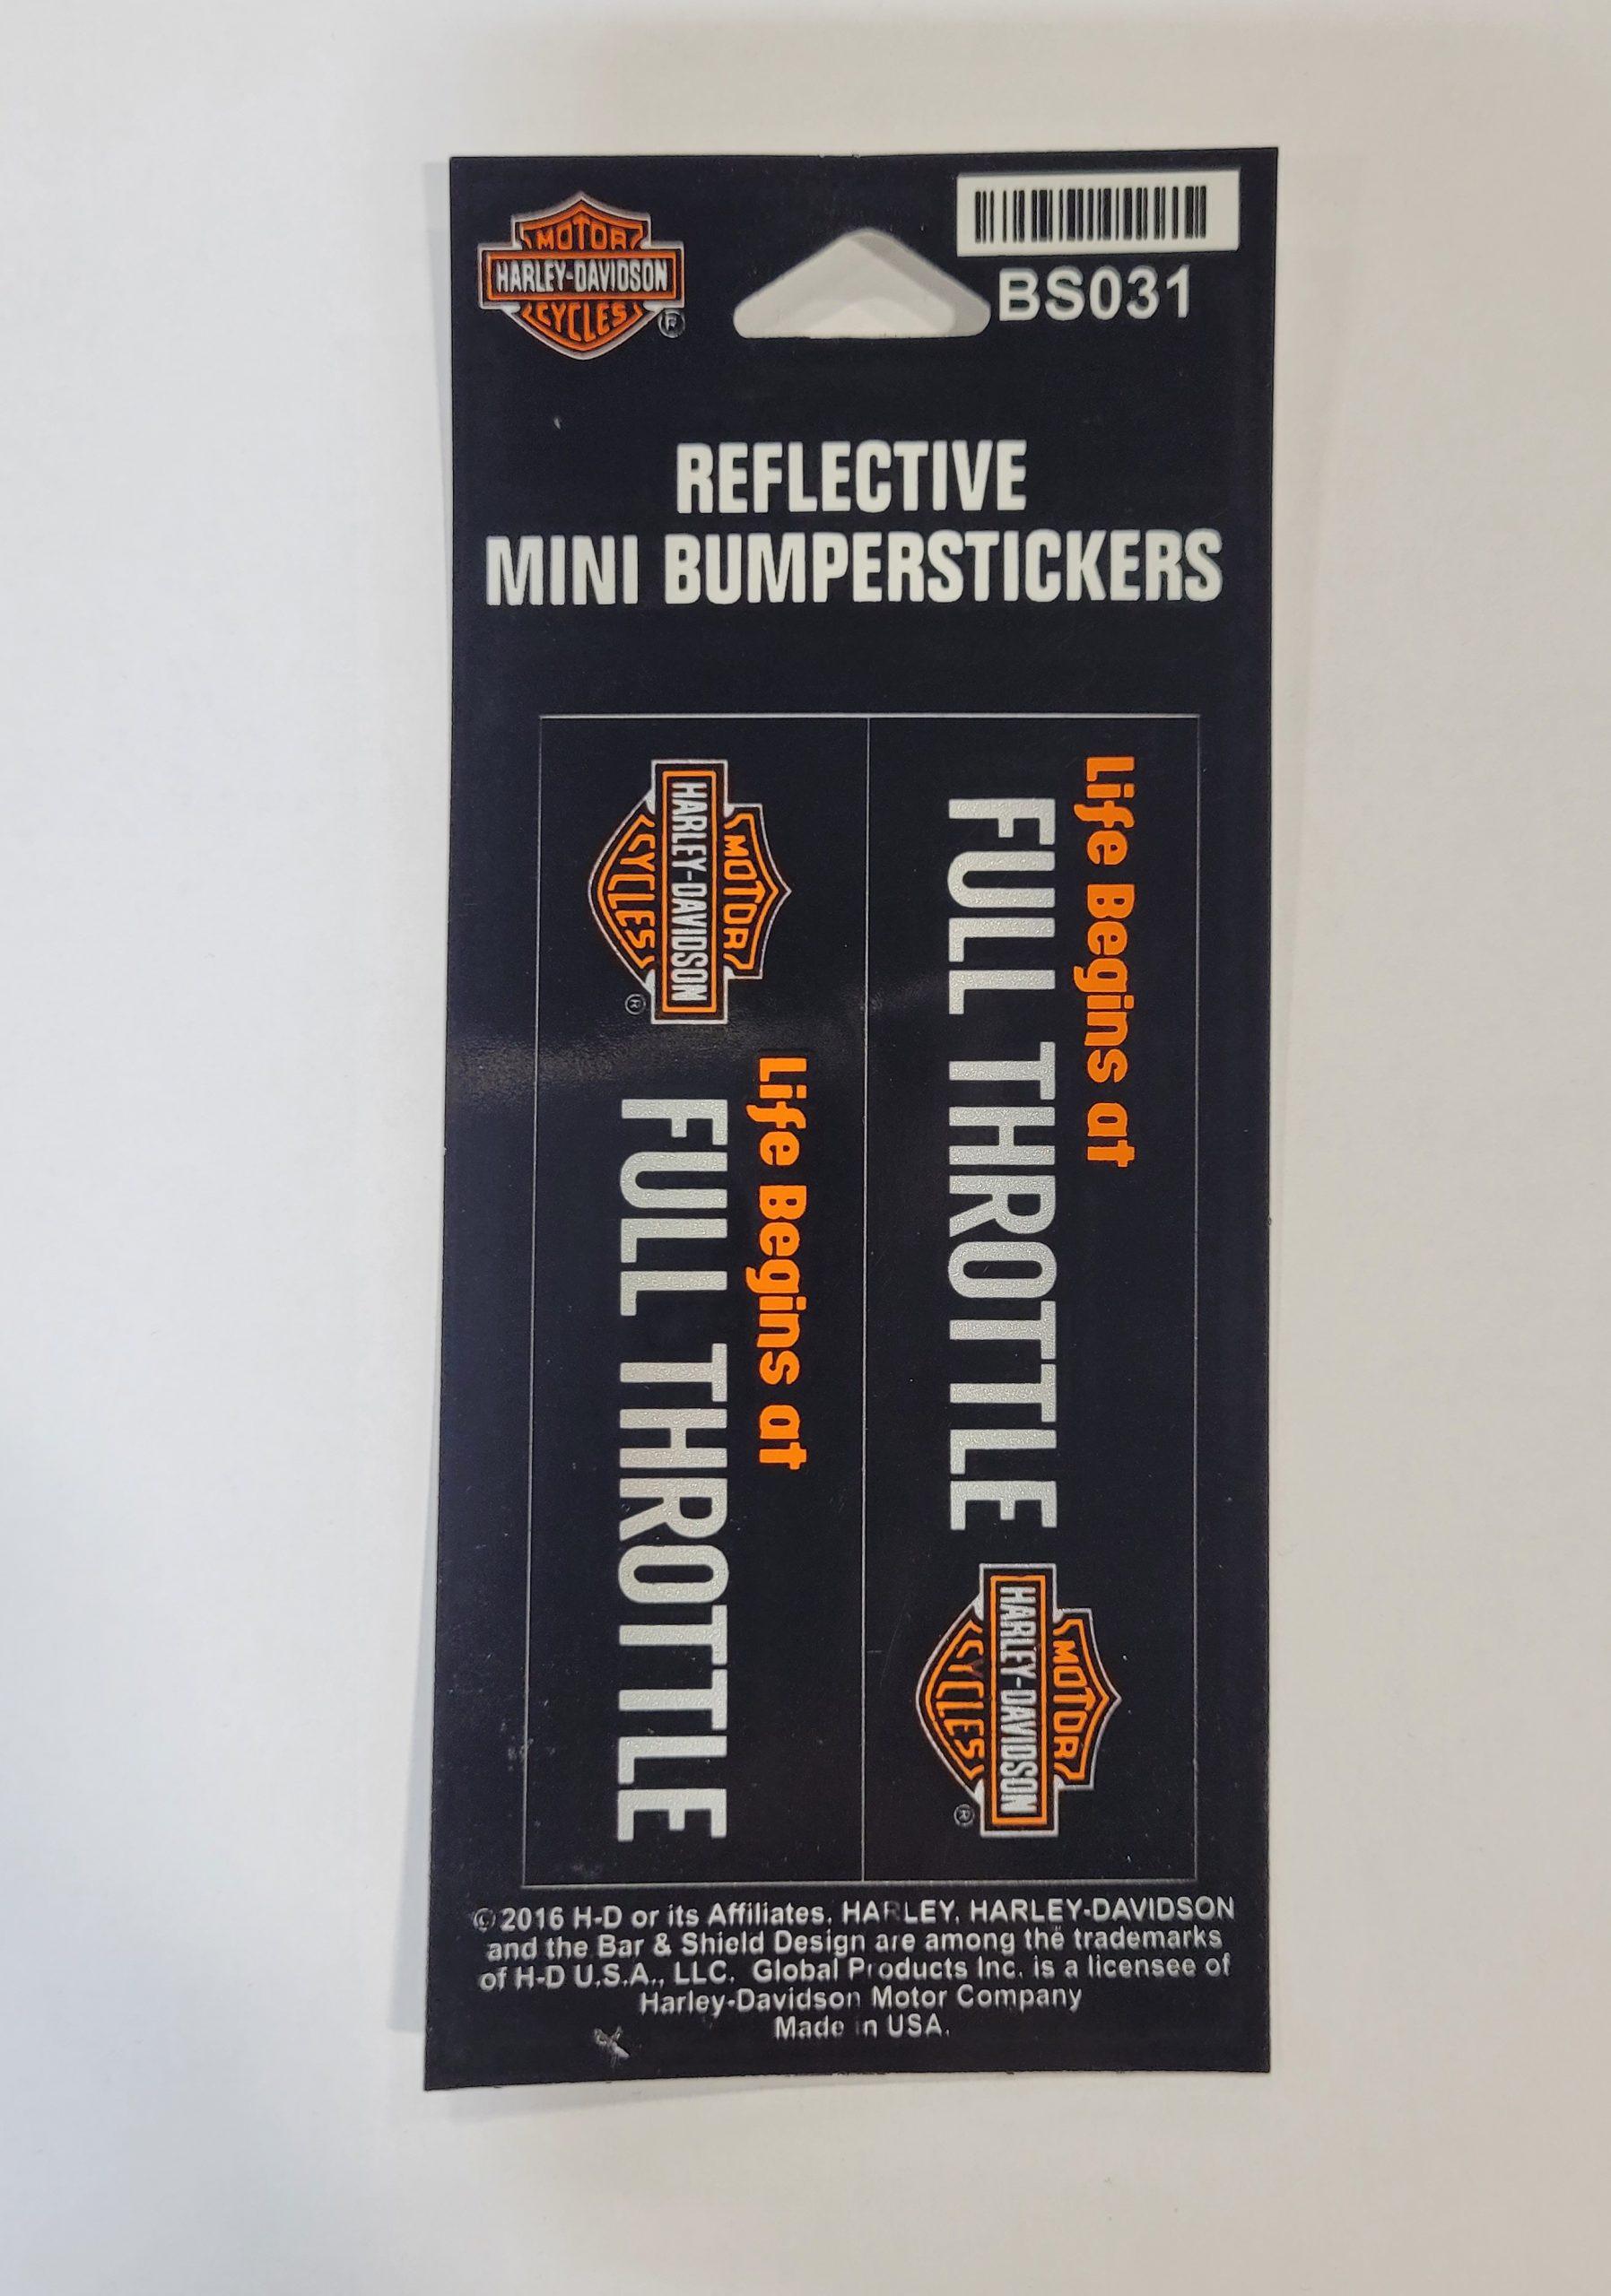 HARLEY DAVIDSON BUMPERSTICKER, FULL THROTTLE, SM, REFLECTIVE, 2 PER SHEET